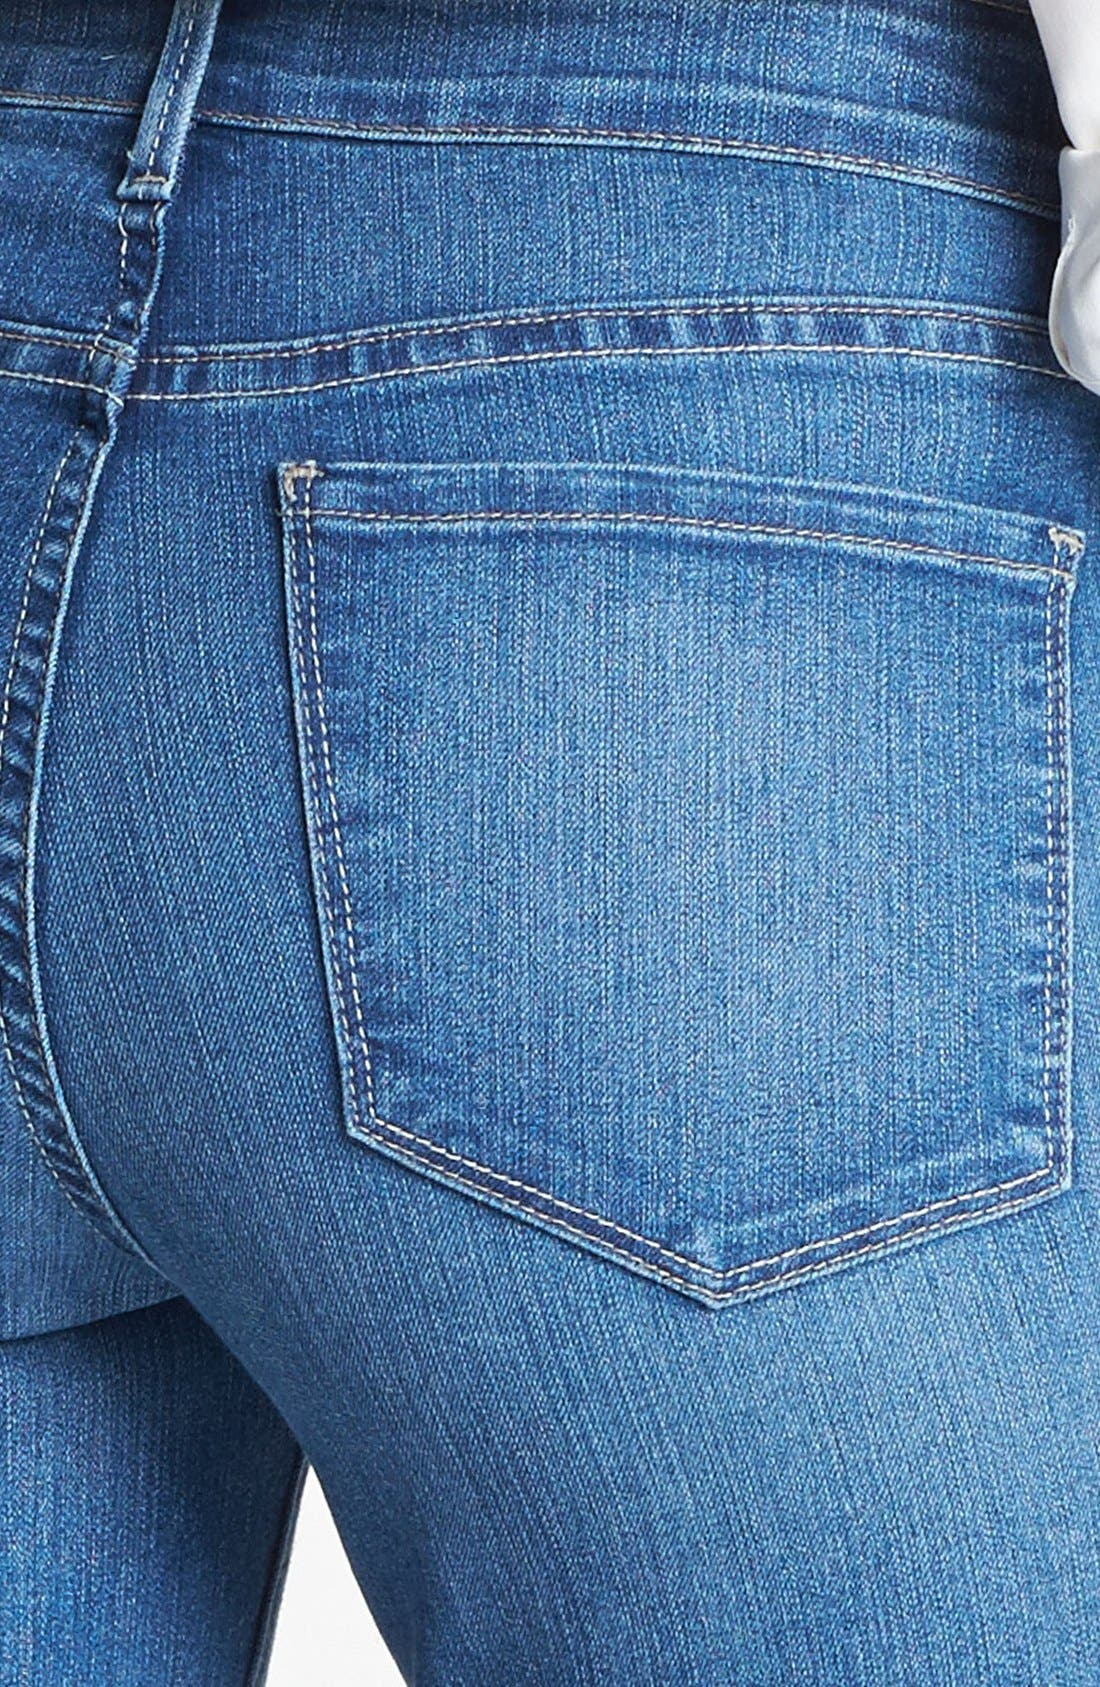 Alternate Image 3  - NYDJ 'Tanya' Cuffed Stretch Boyfriend Jeans